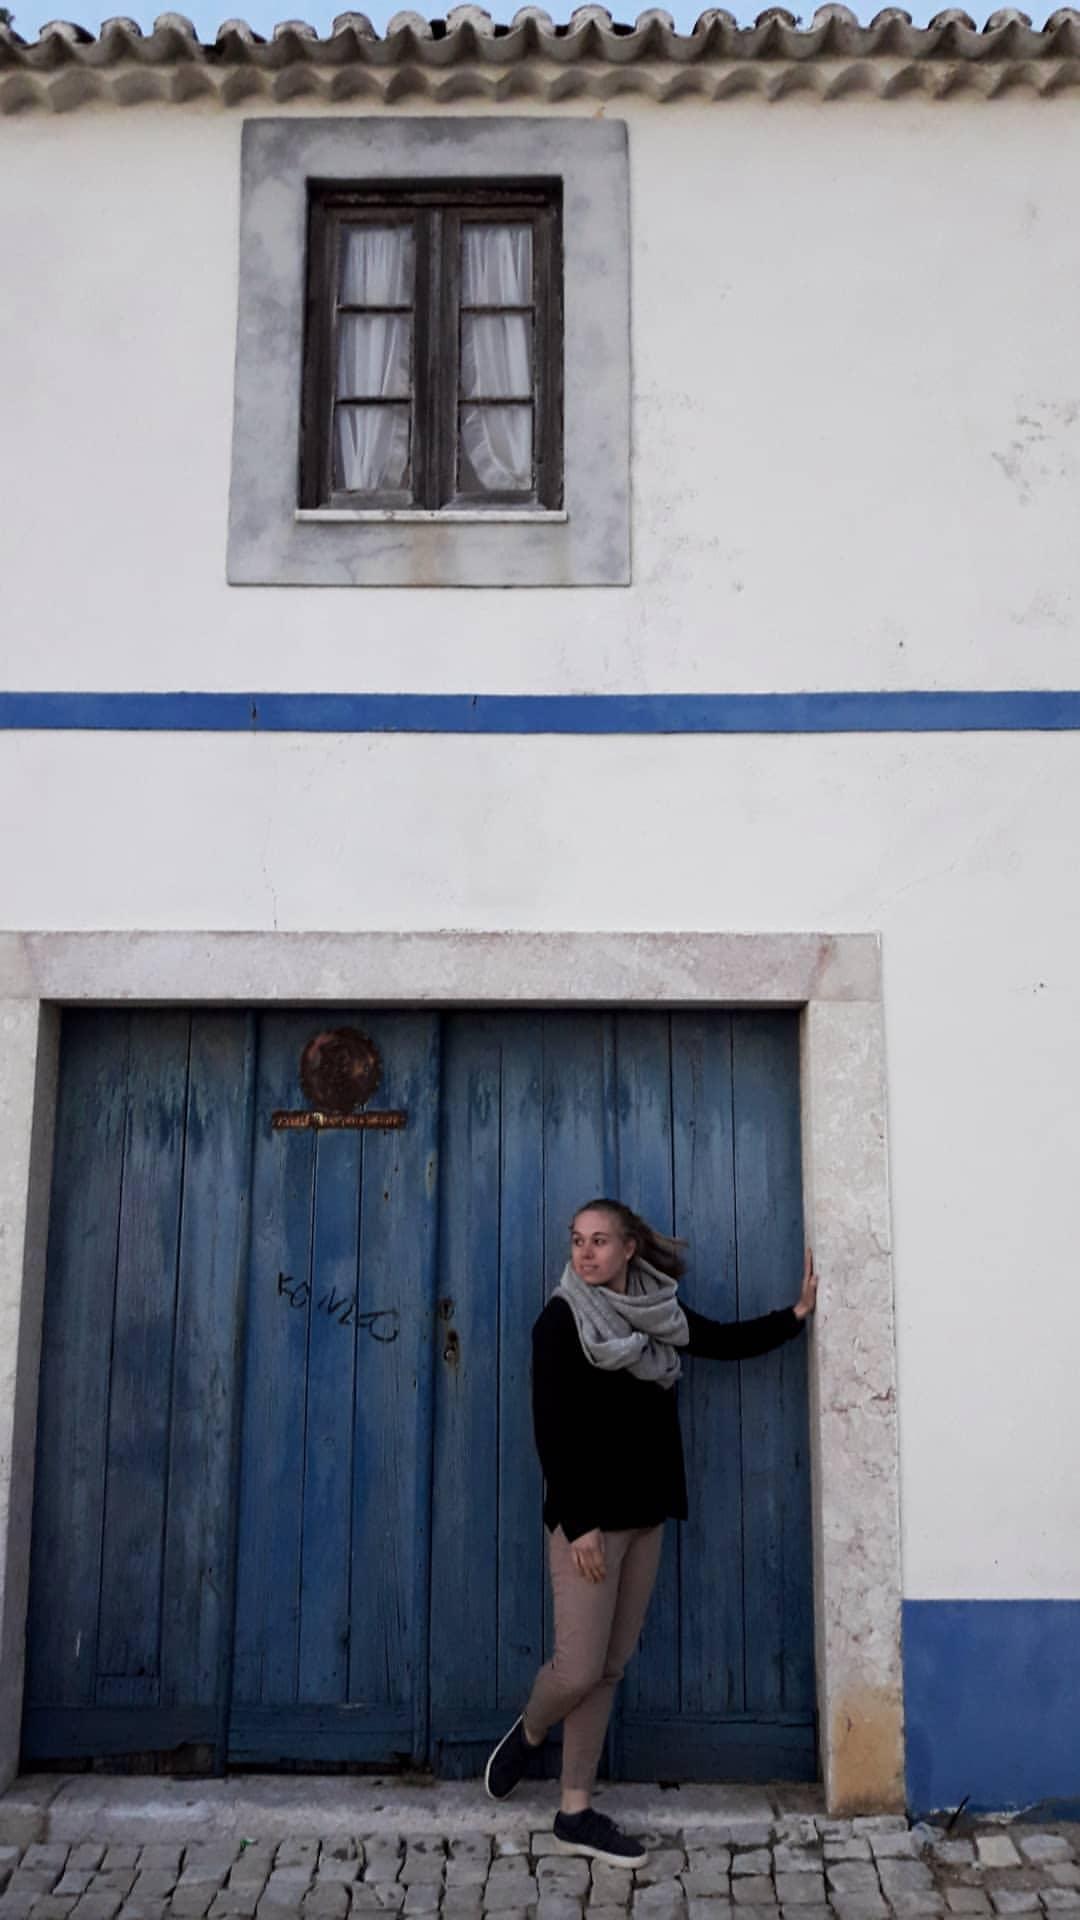 Tor-Wand-Mensch in Tür.jpg